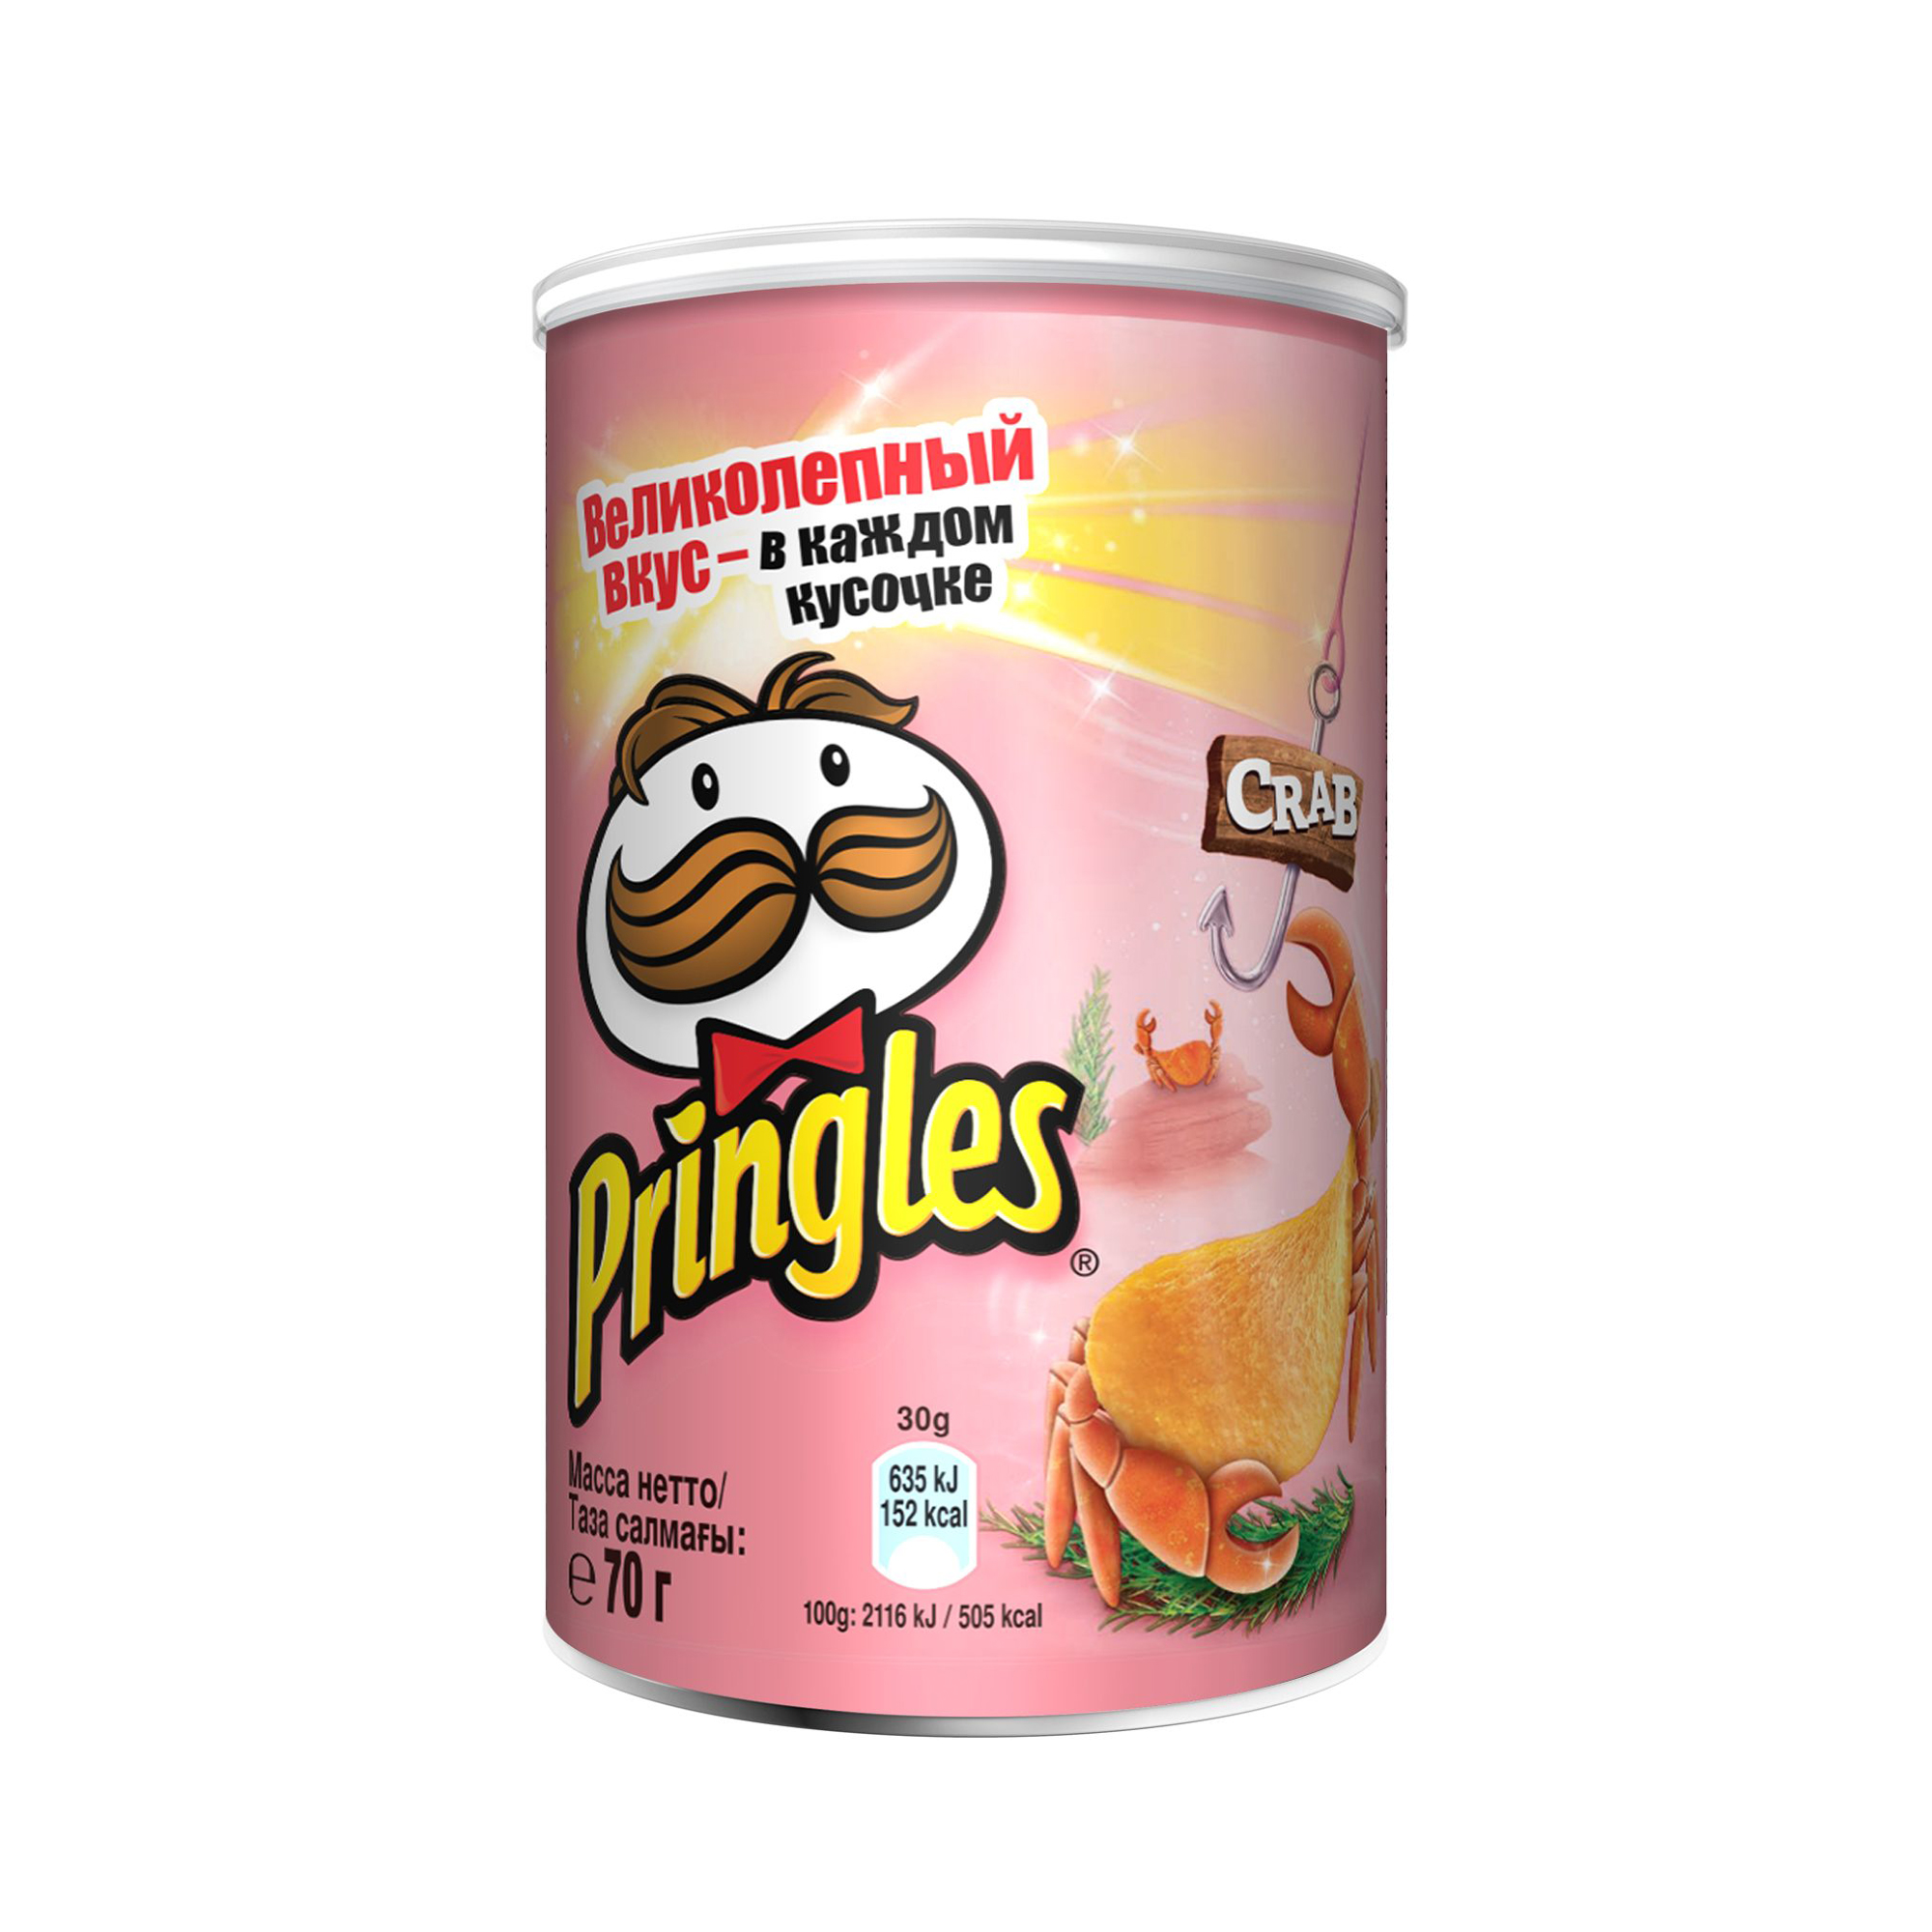 Чипсы Pringles Краб 70 г чипсы pringles картофельные crab 70 г